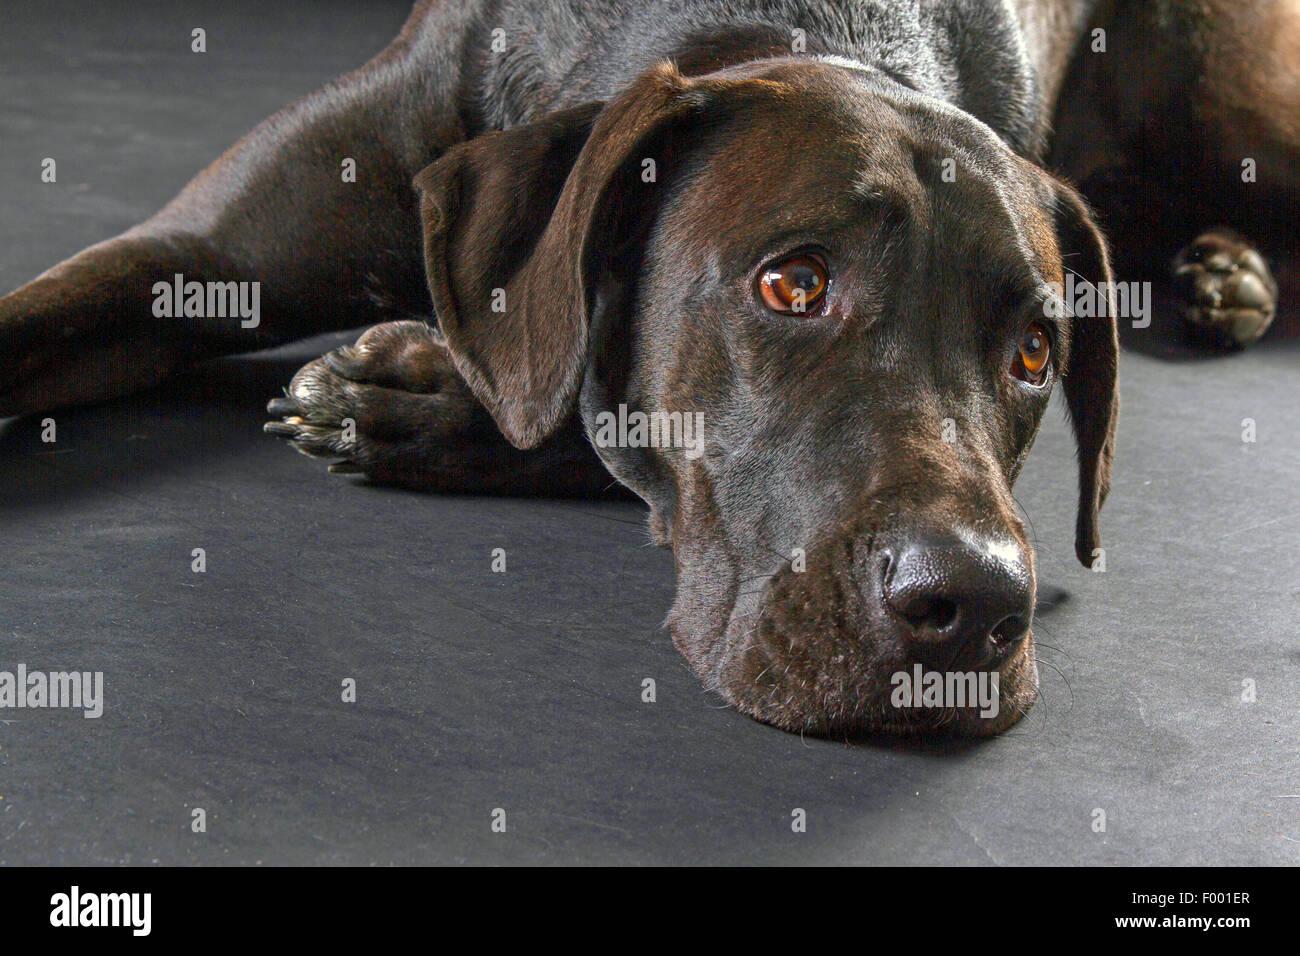 Labrador Retriever (Canis lupus f. familiaris), black-haired Labrador Retriever lyingon la parole, portrait Photo Stock